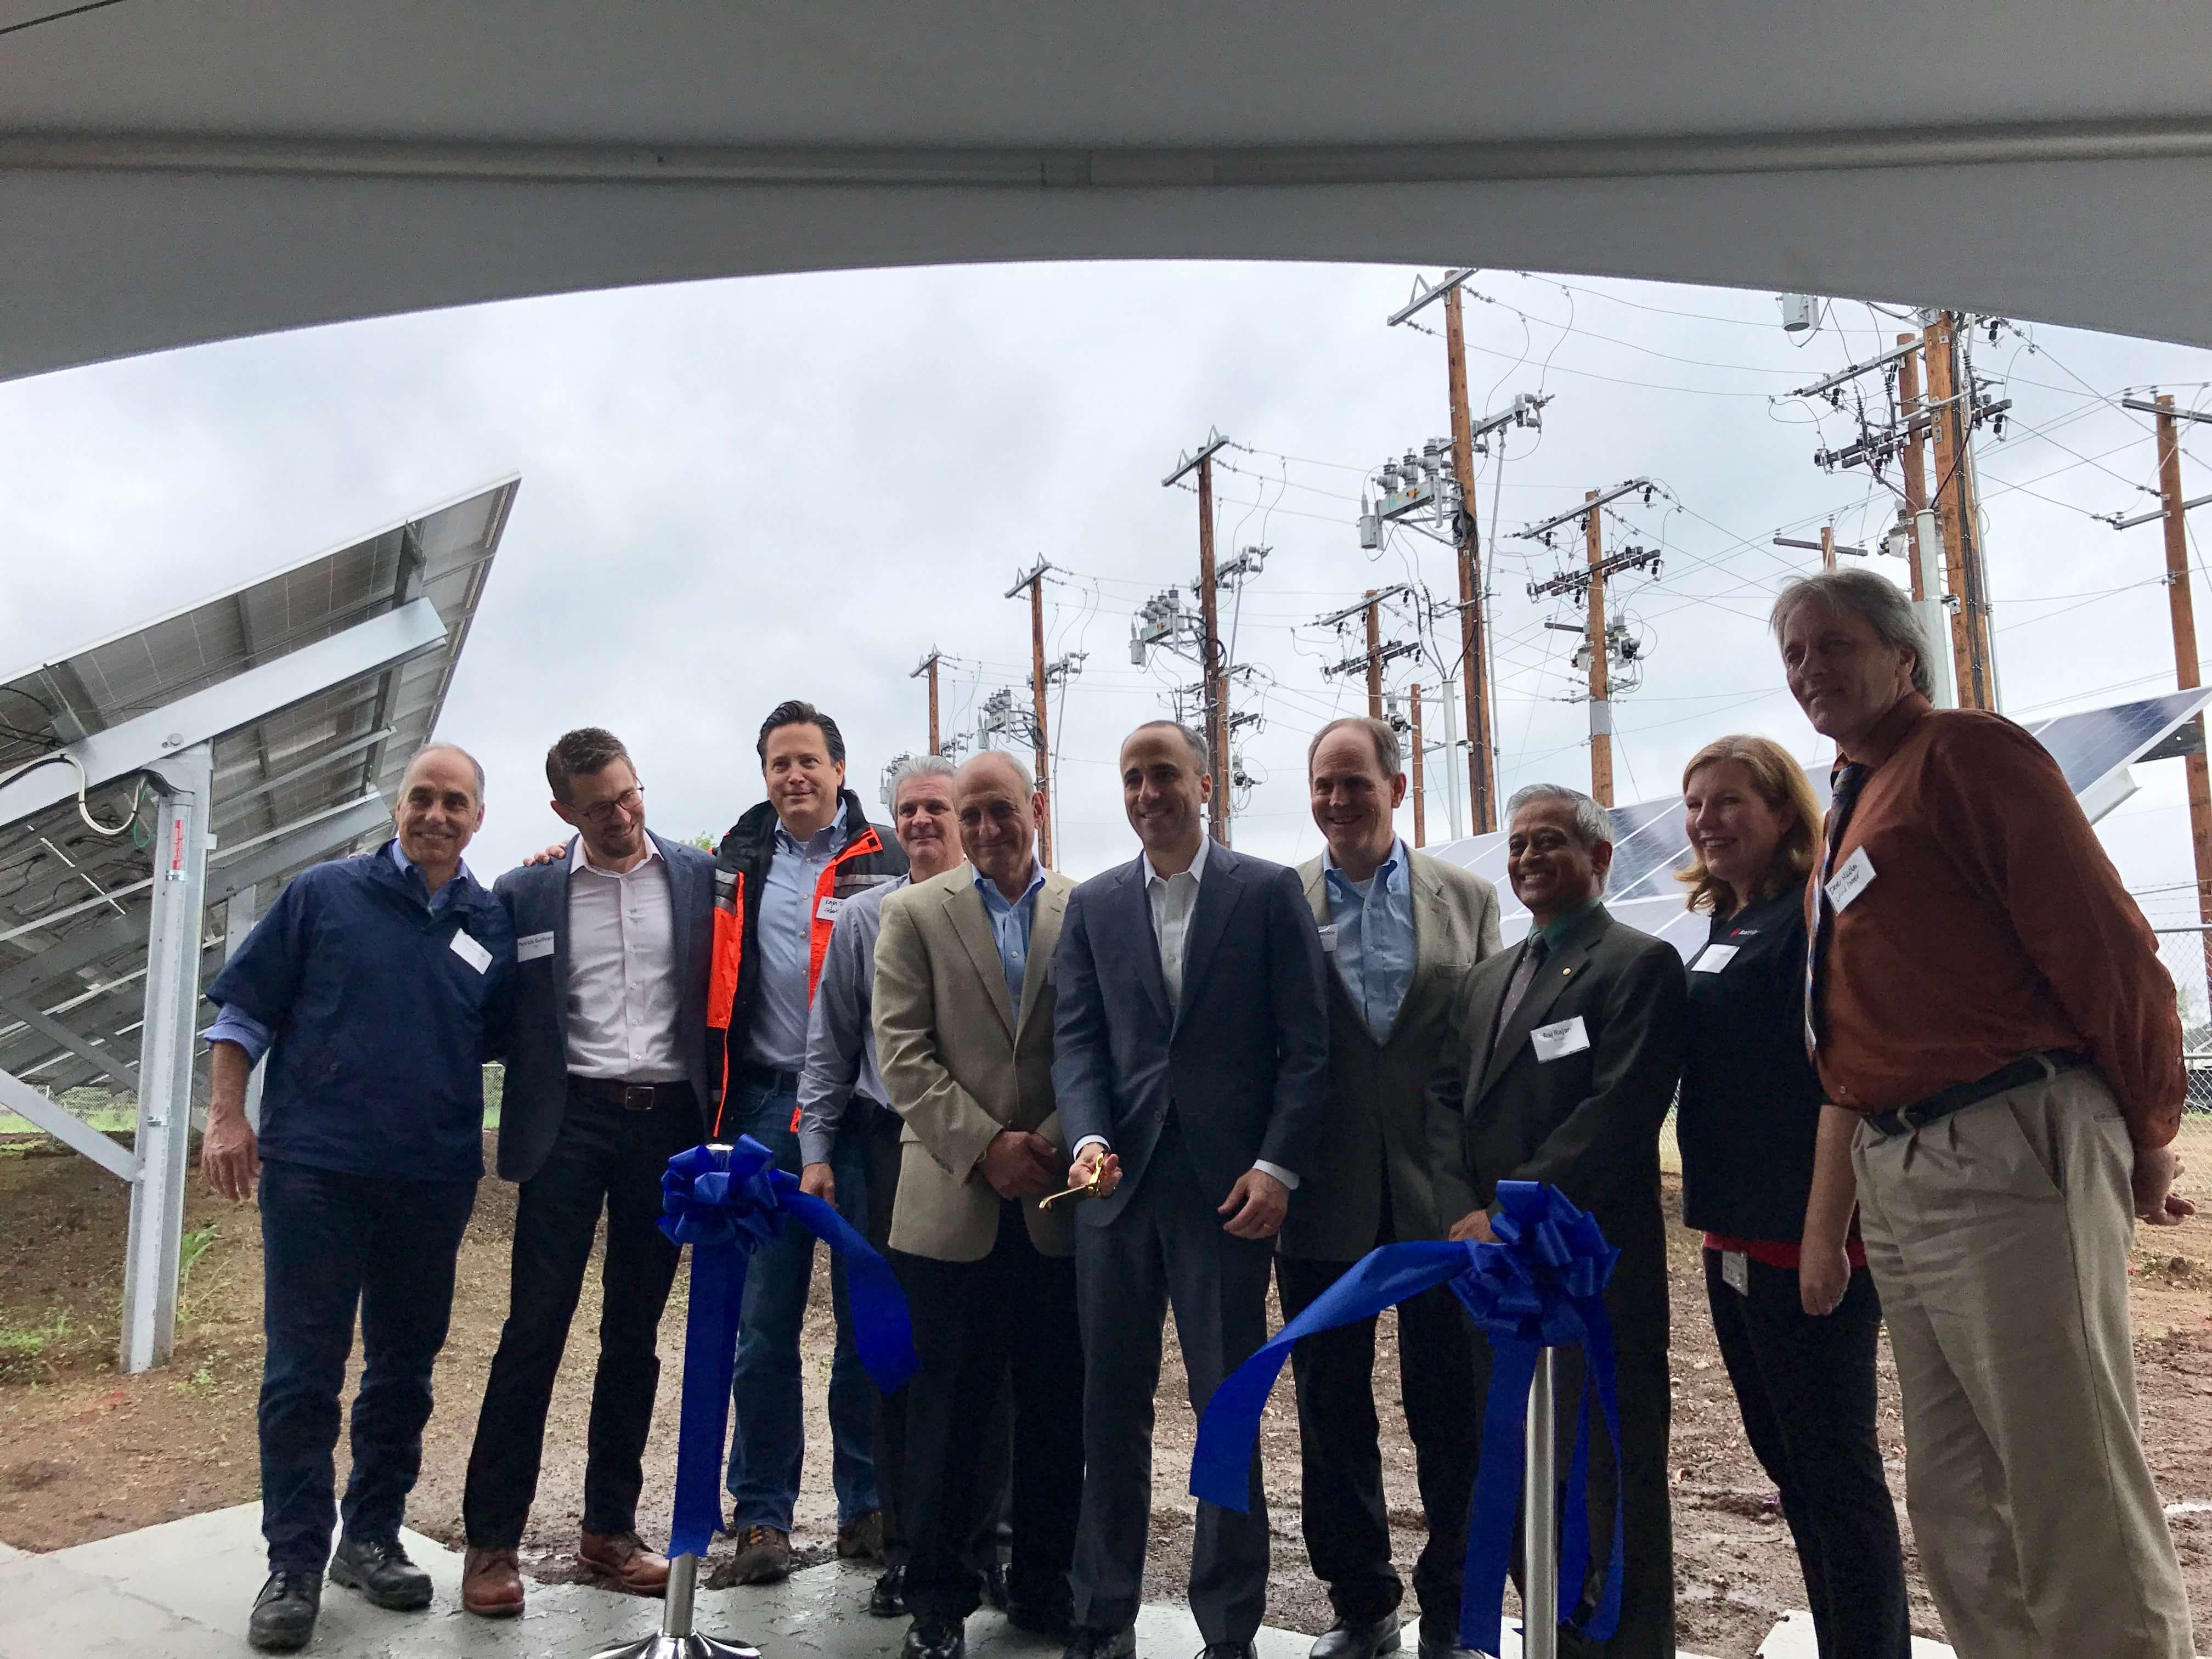 NRG-Minnesota NRG Adds 32 MW Of Community Solar In Minnesota